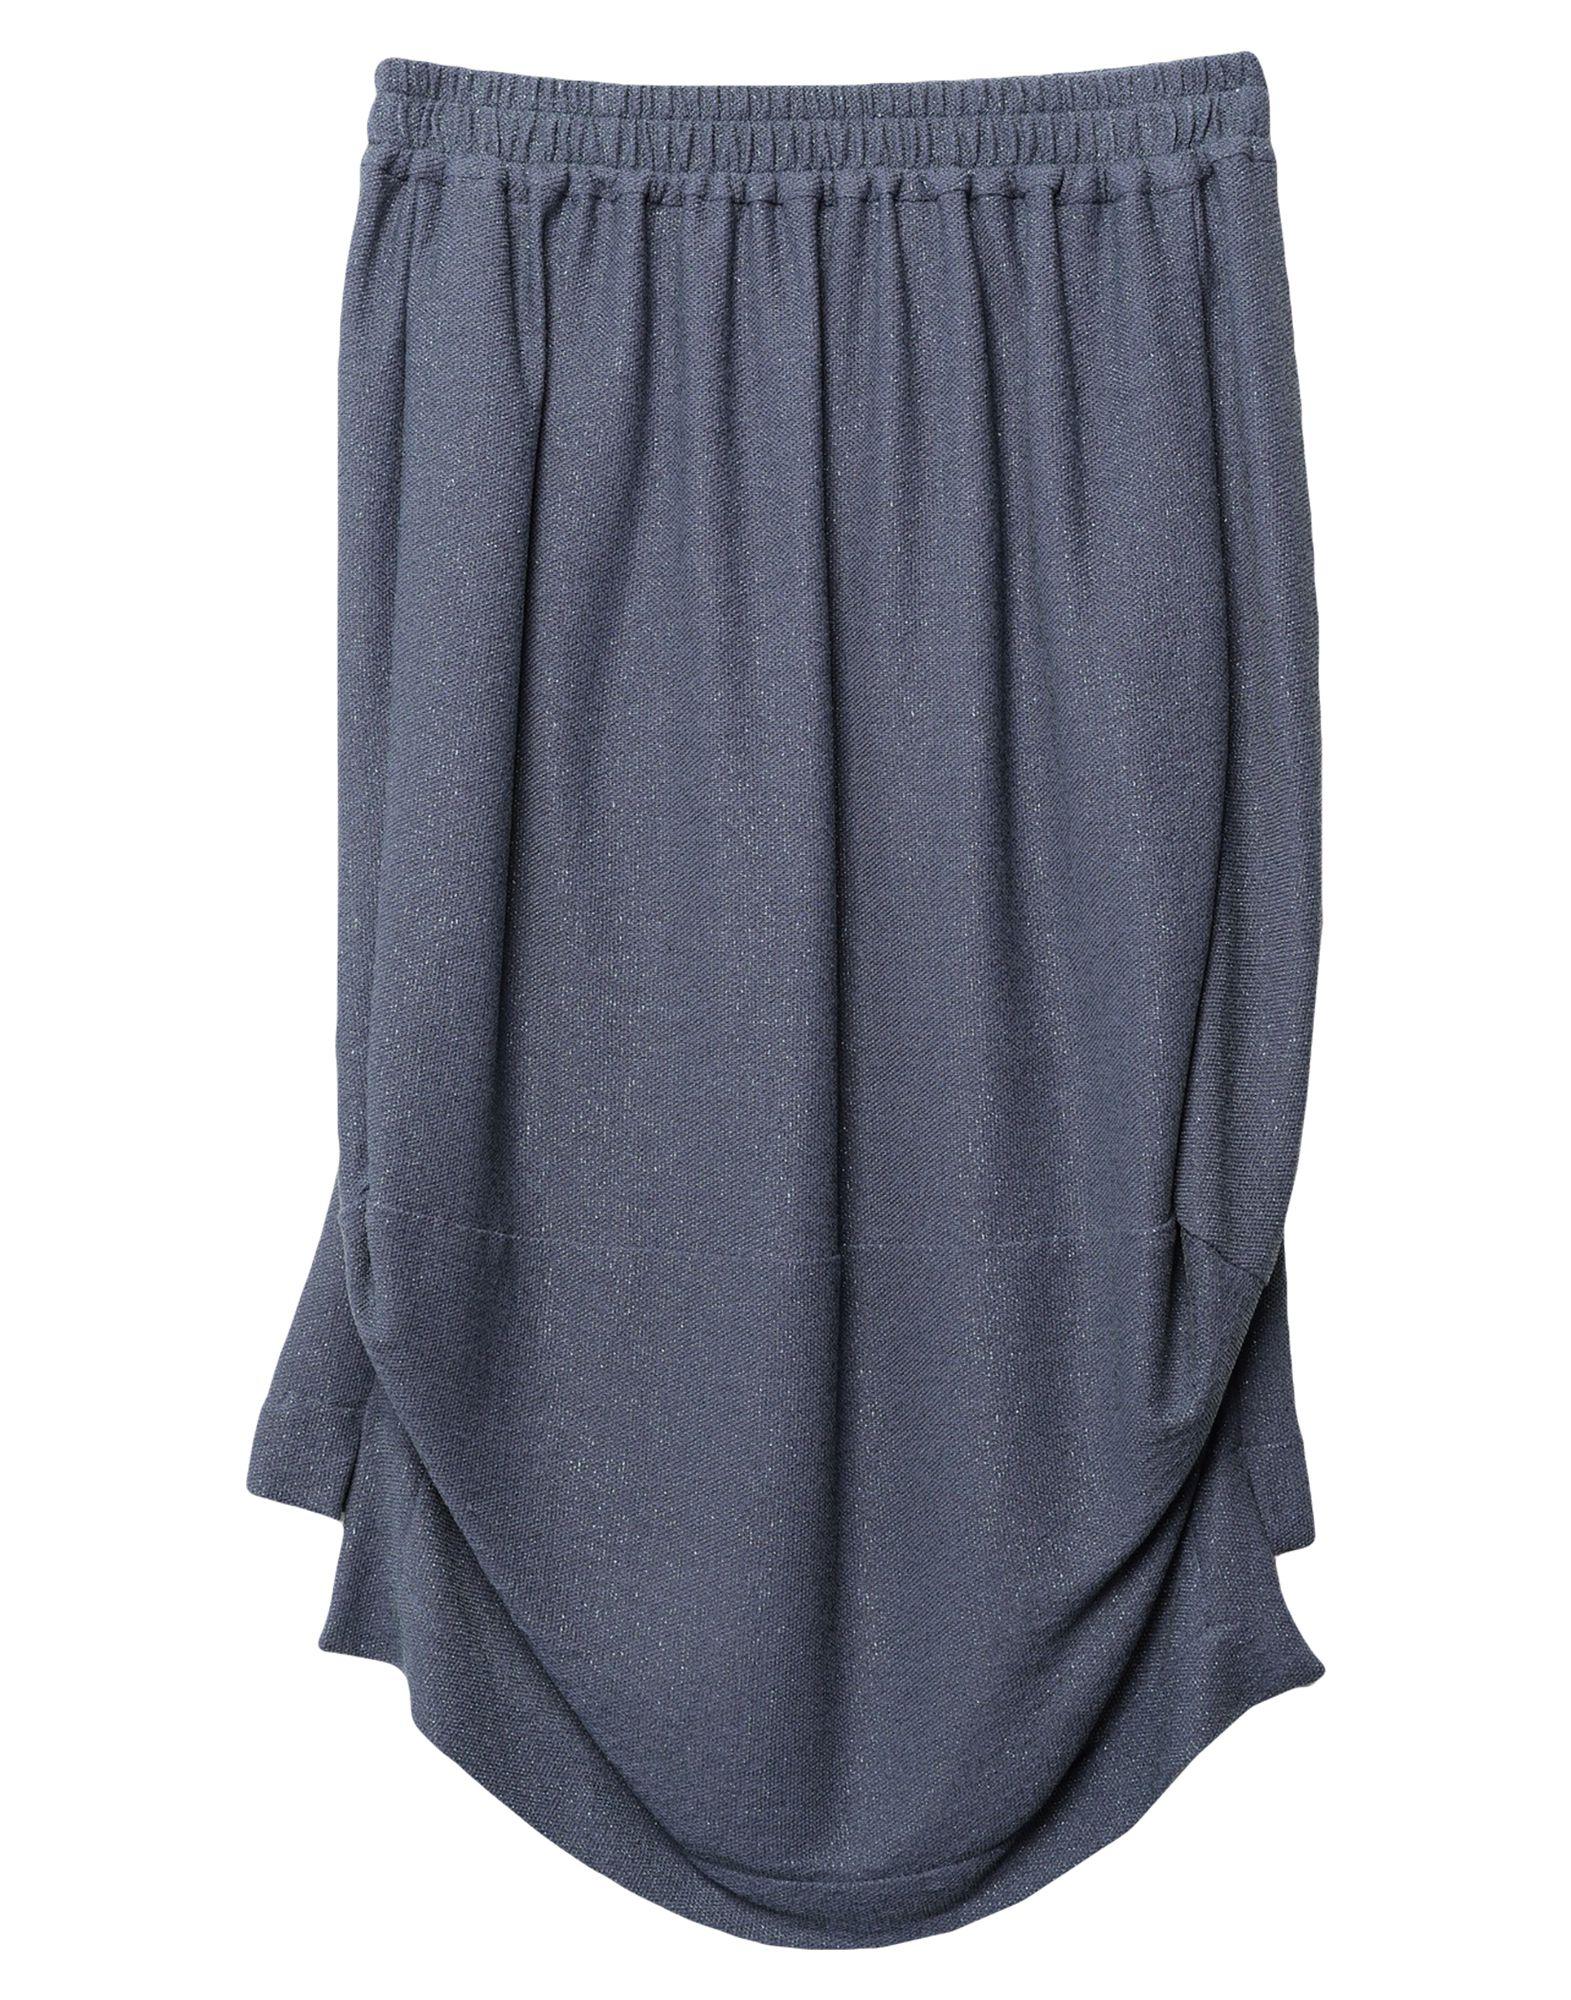 VIVIENNE WESTWOOD ANGLOMANIA Юбка длиной 3/4 vivienne westwood anglomania платье длиной 3 4